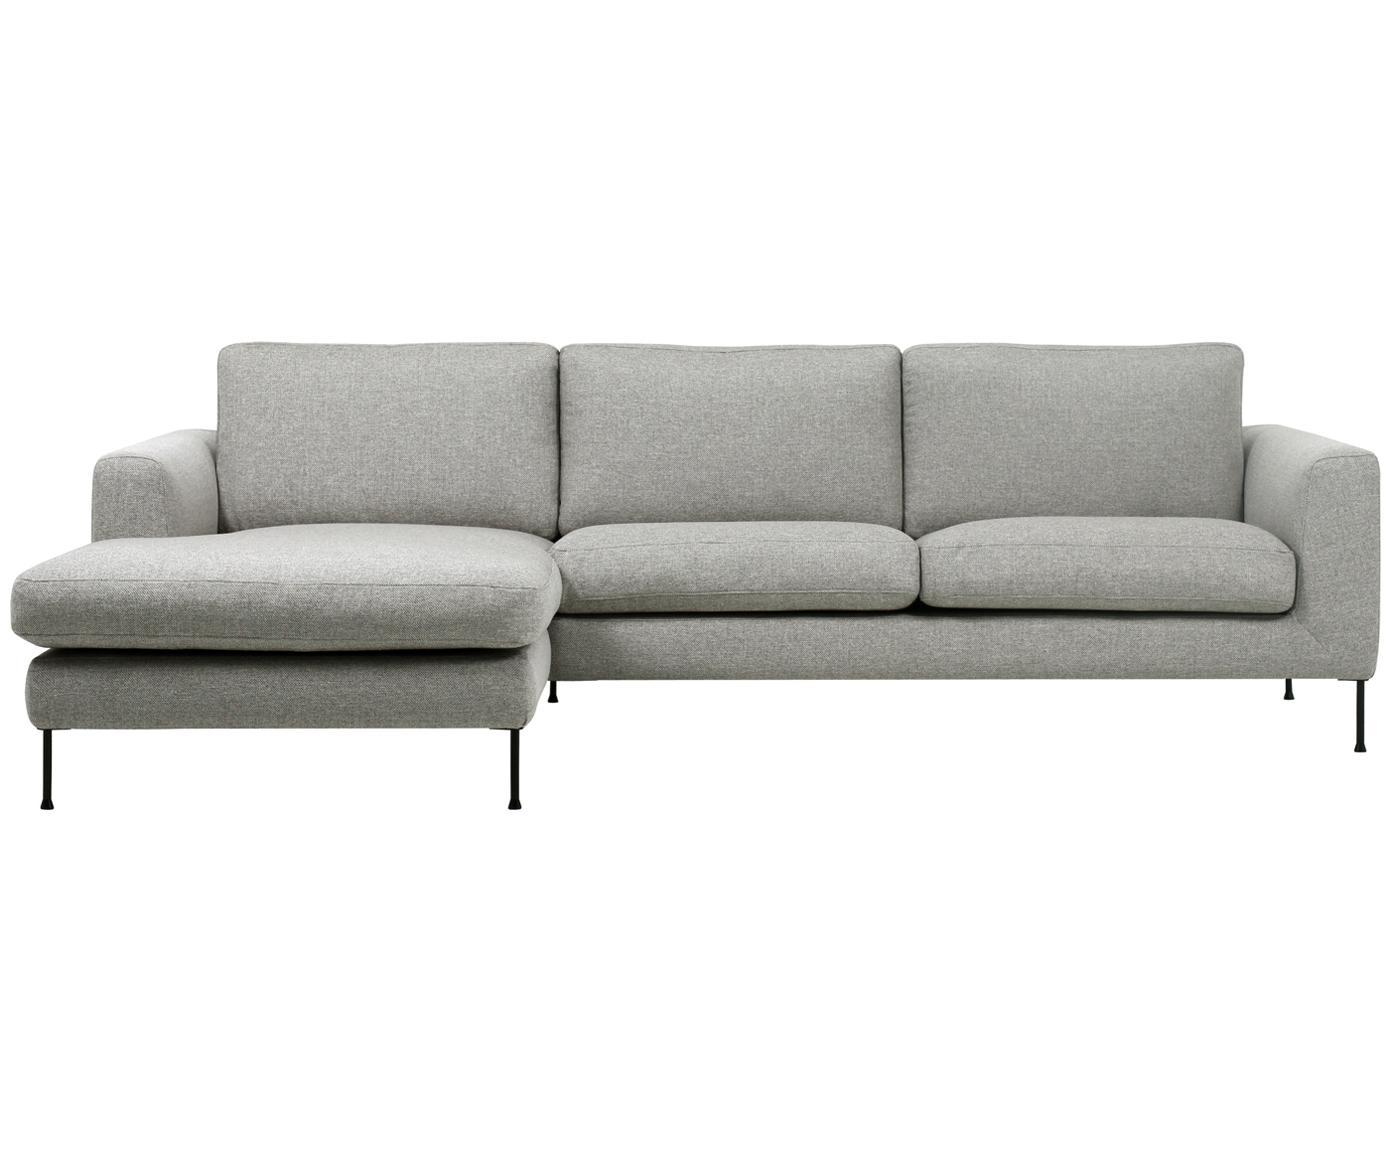 Ecksofa Cucita (3-Sitzer), Bezug: Webstoff (Polyester) 45.0, Gestell: Massives Kiefernholz, Füße: Metall, lackiert, Webstoff Hellgrau, B 262 x T 163 cm